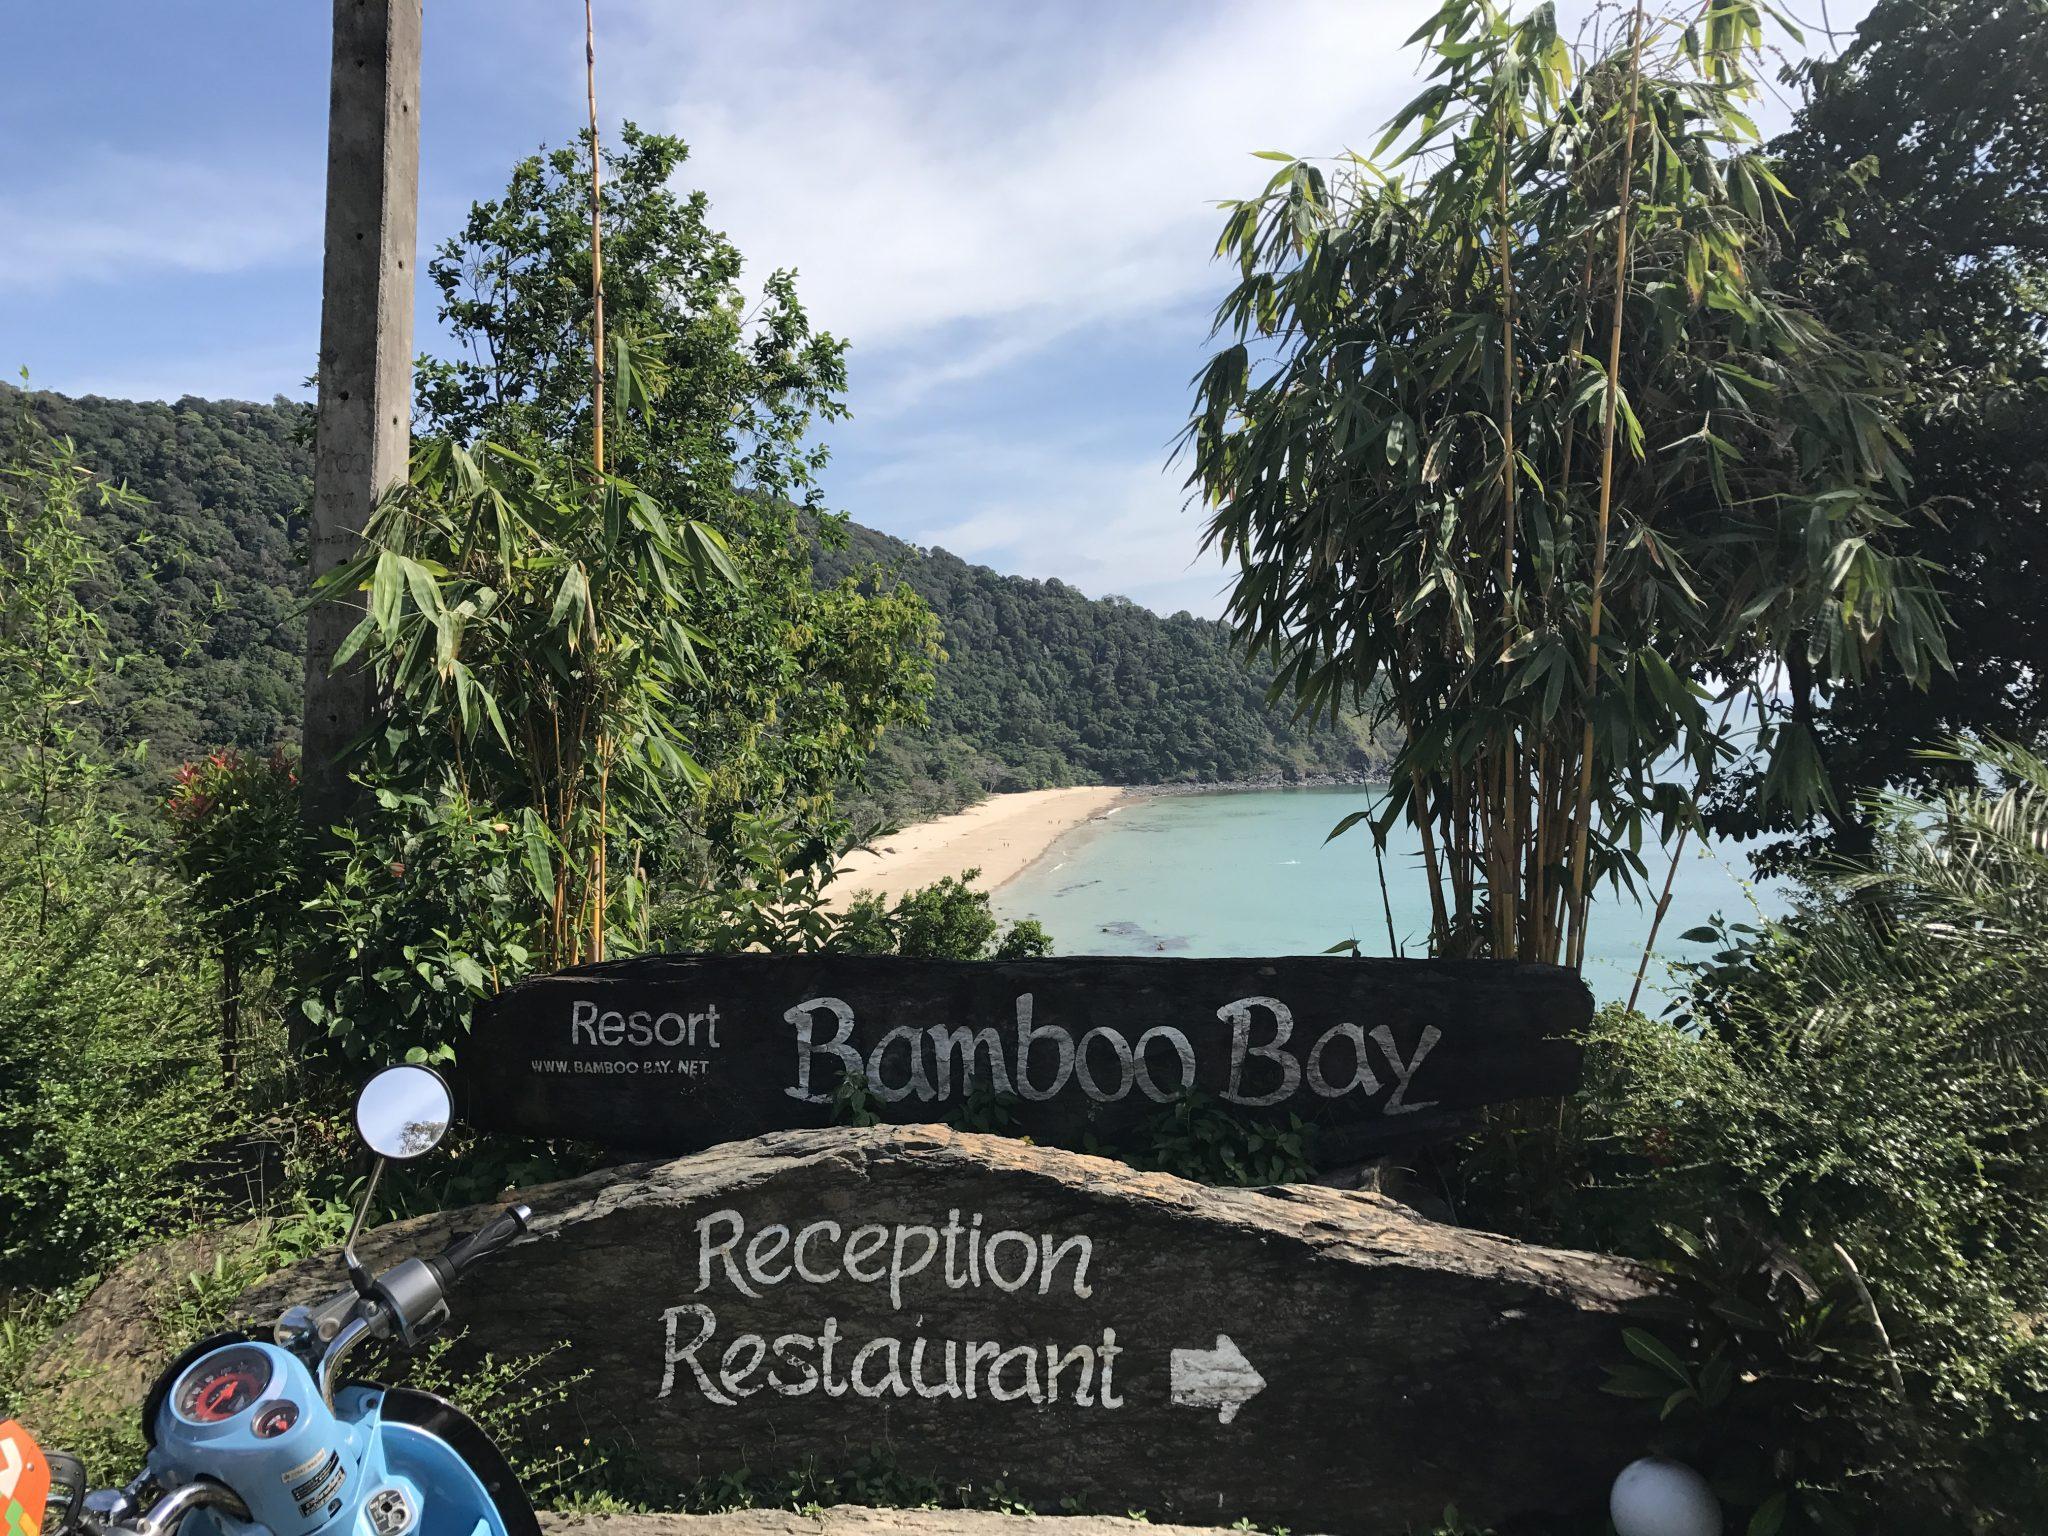 bamboo bay.JPG